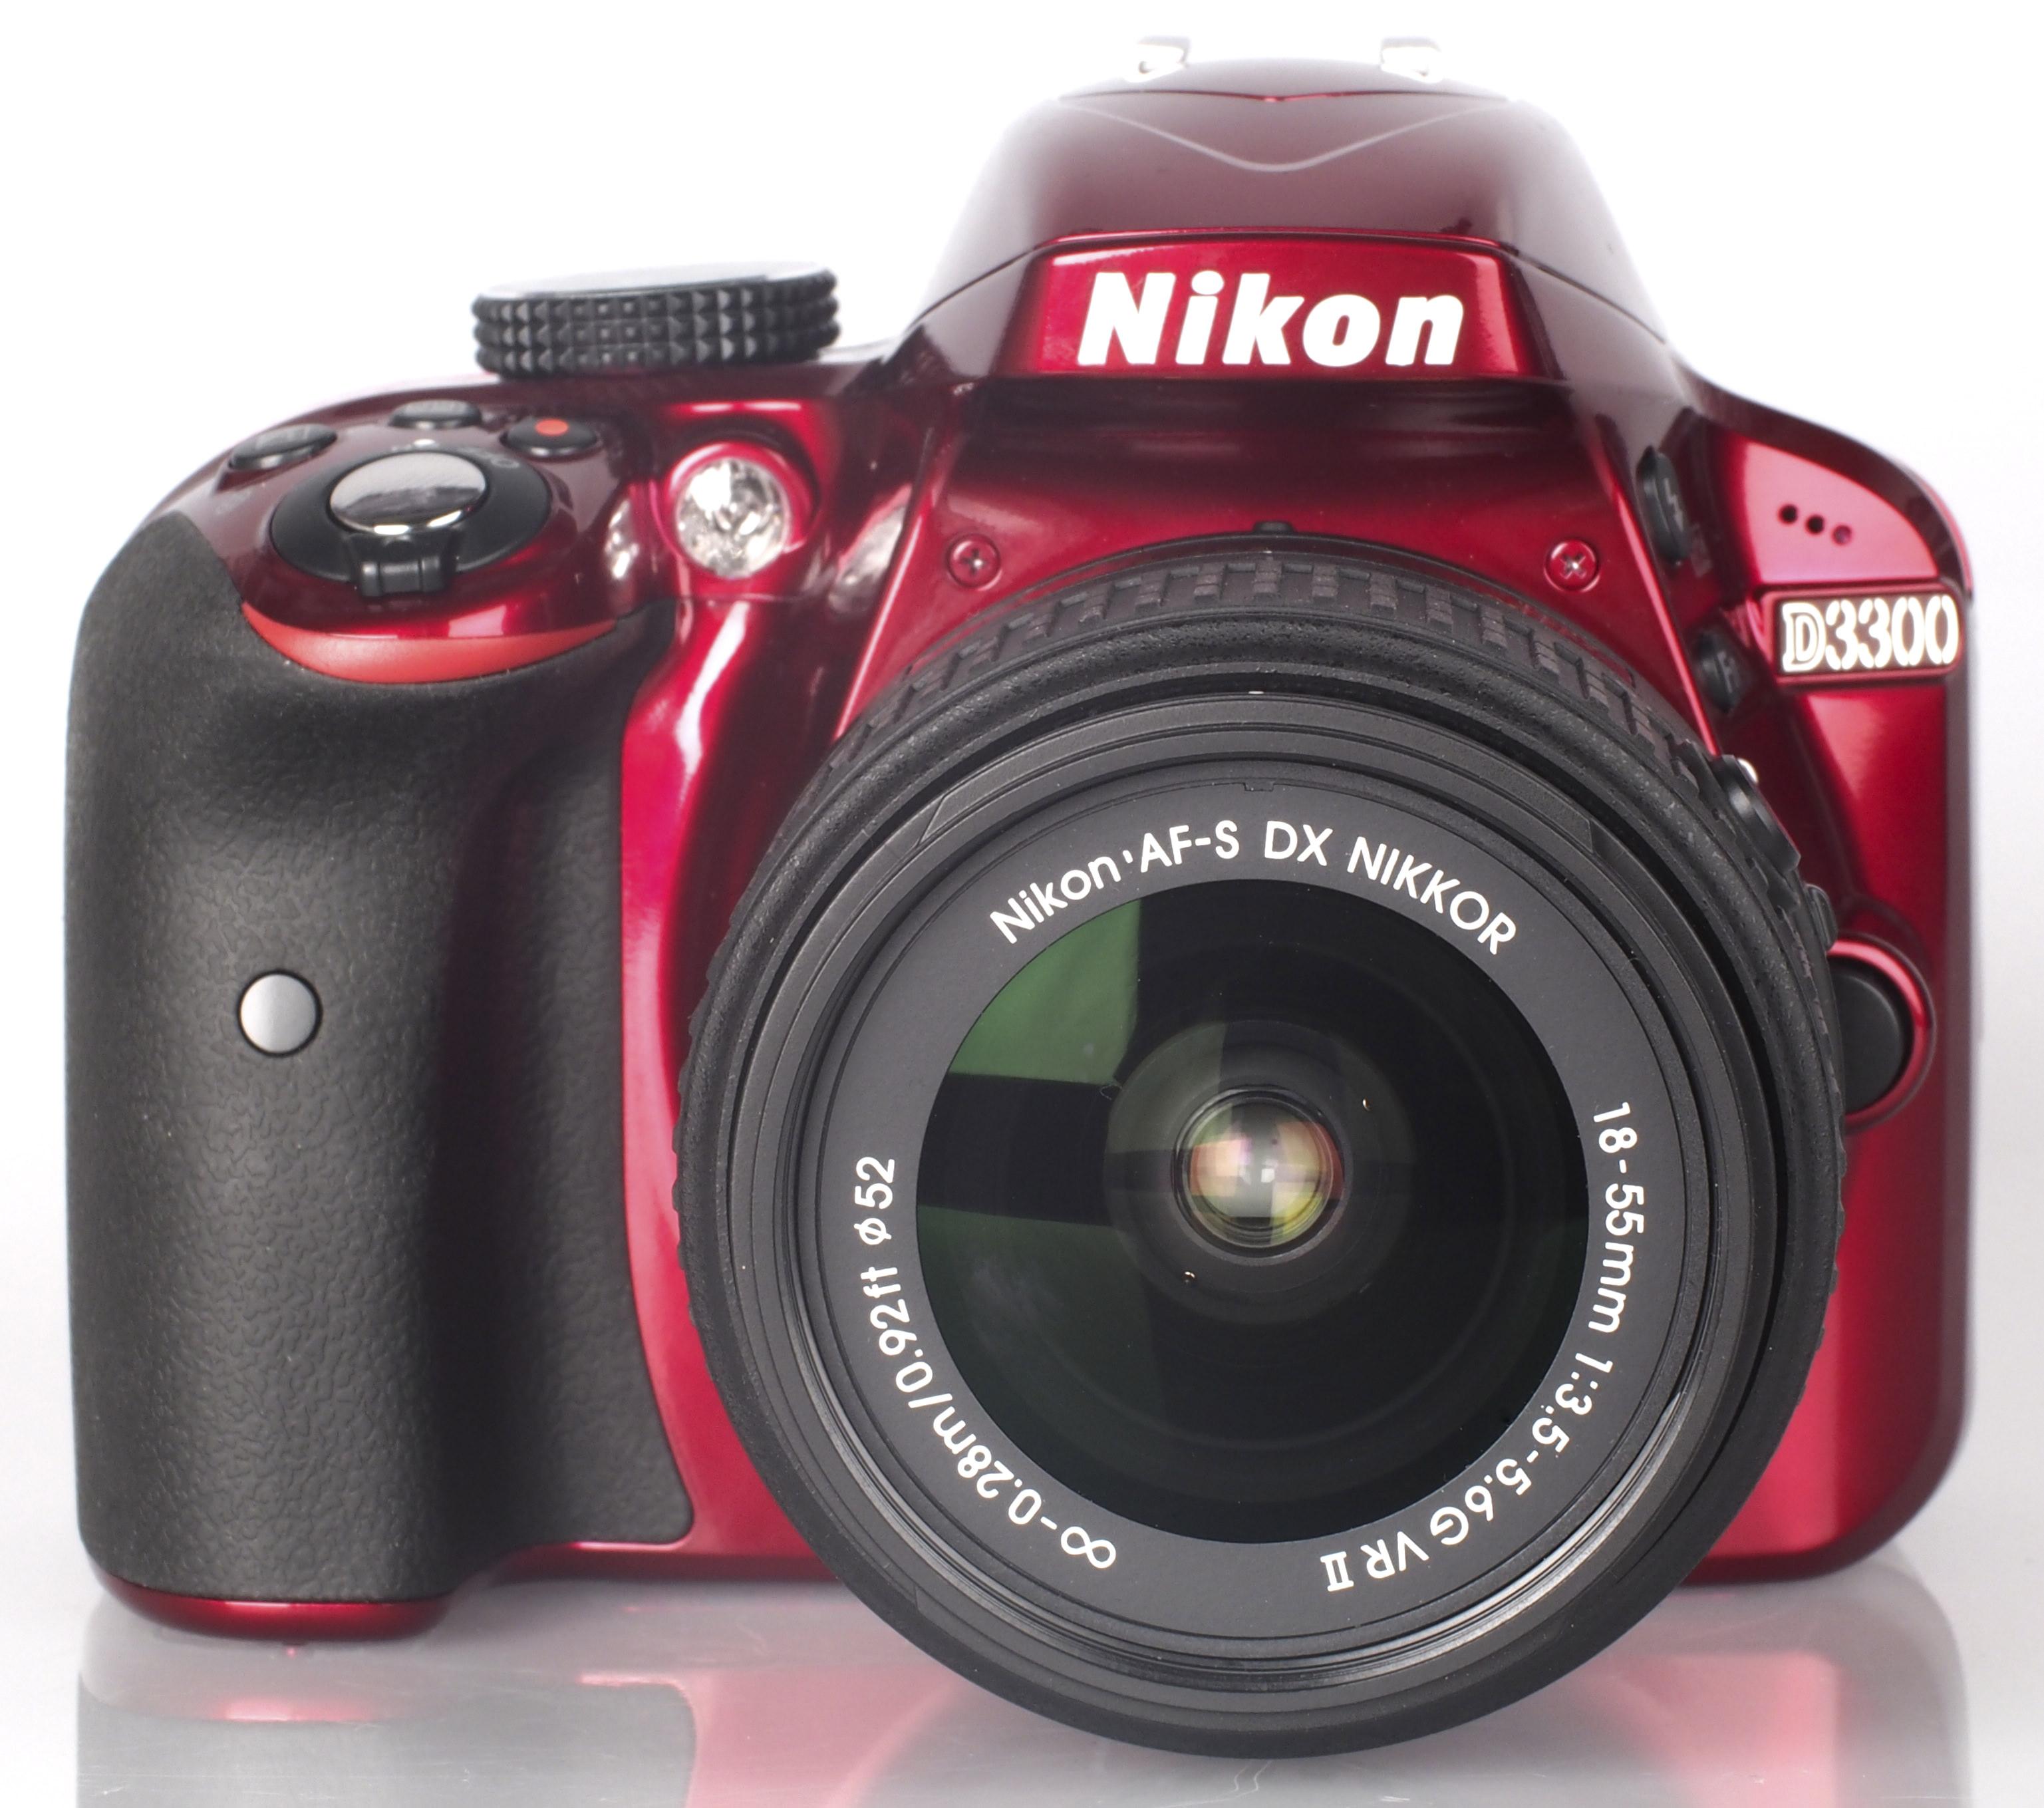 Camera Nikon Small Dslr Camera nikon d3300 dslr review highres red 16